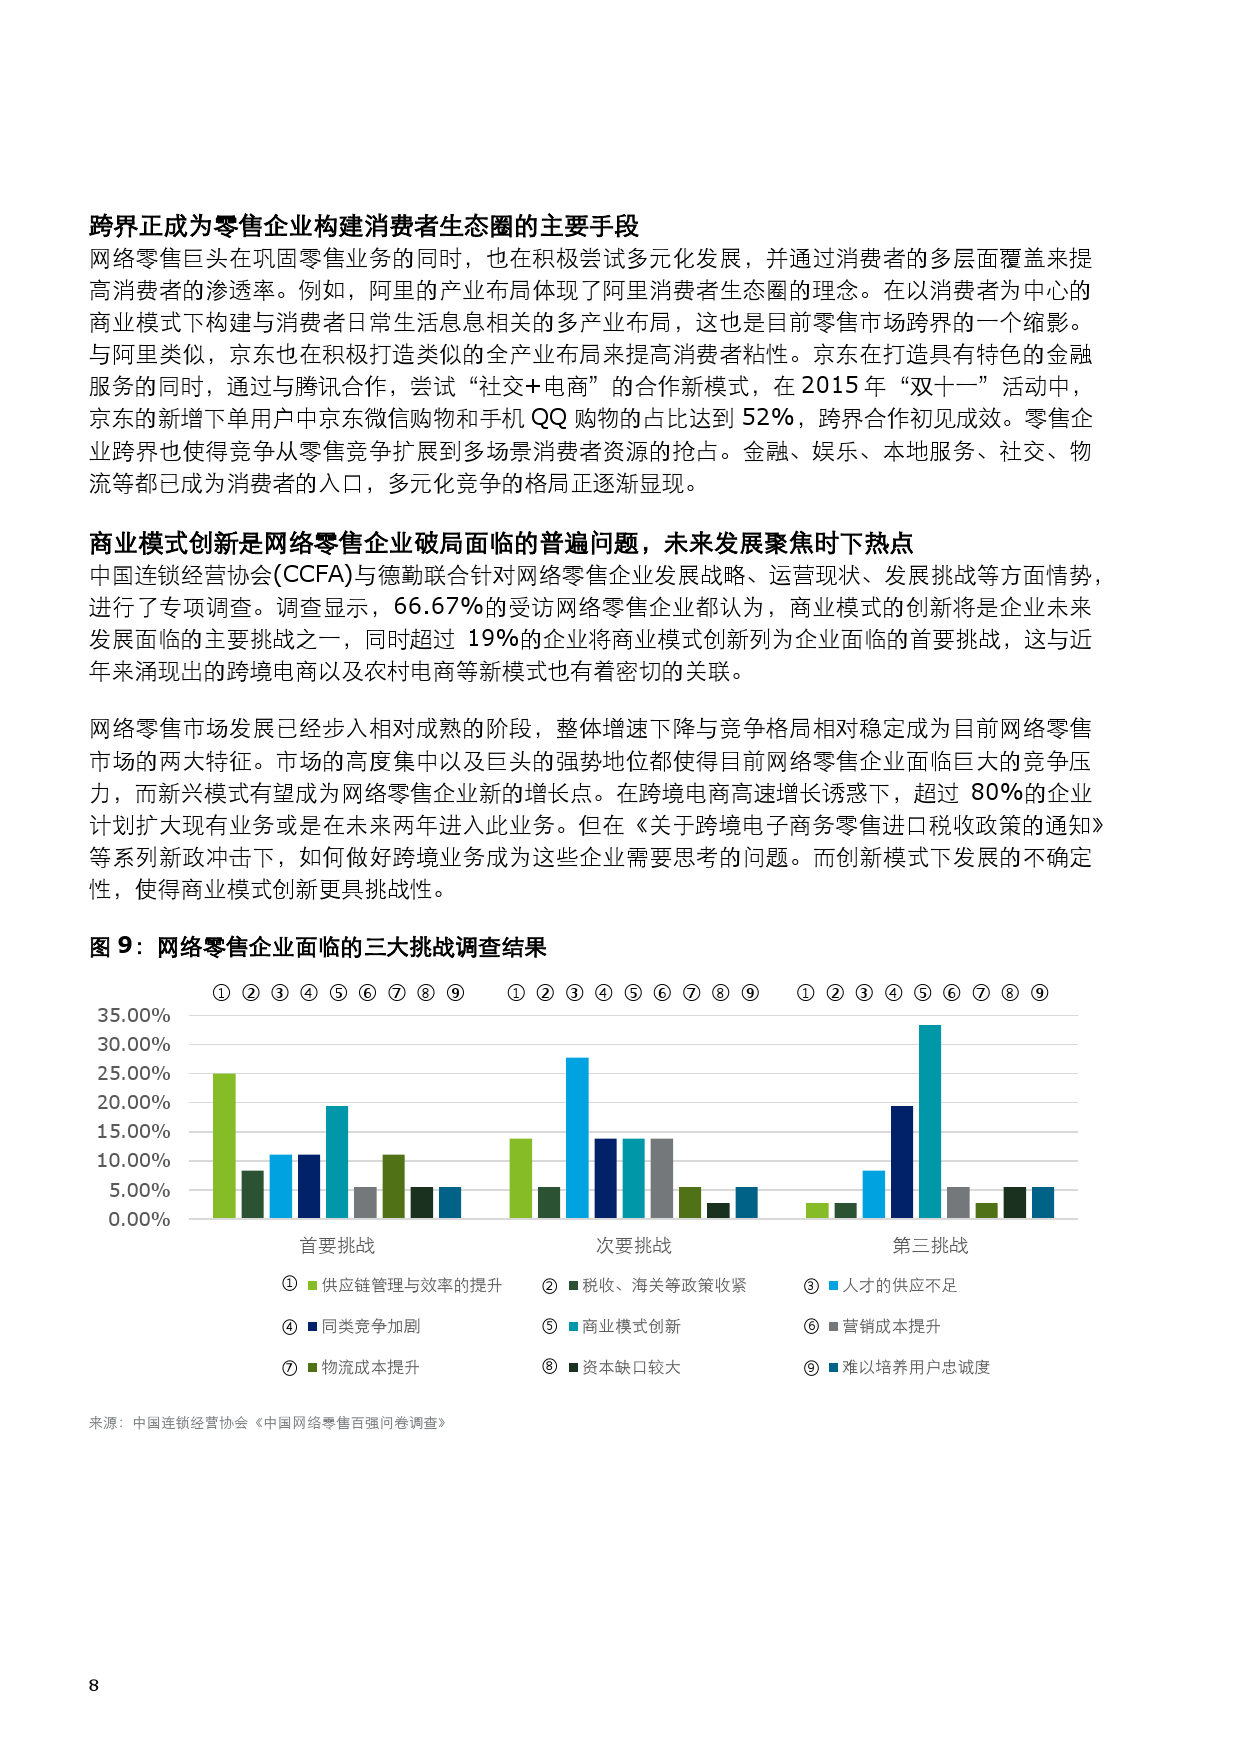 2016%e4%b8%ad%e5%9b%bd%e7%bd%91%e7%bb%9c%e9%9b%b6%e5%94%ae%e5%b8%82%e5%9c%ba%e5%8f%91%e5%b1%95%e7%a0%94%e7%a9%b6%e6%8a%a5%e5%91%8a_000012